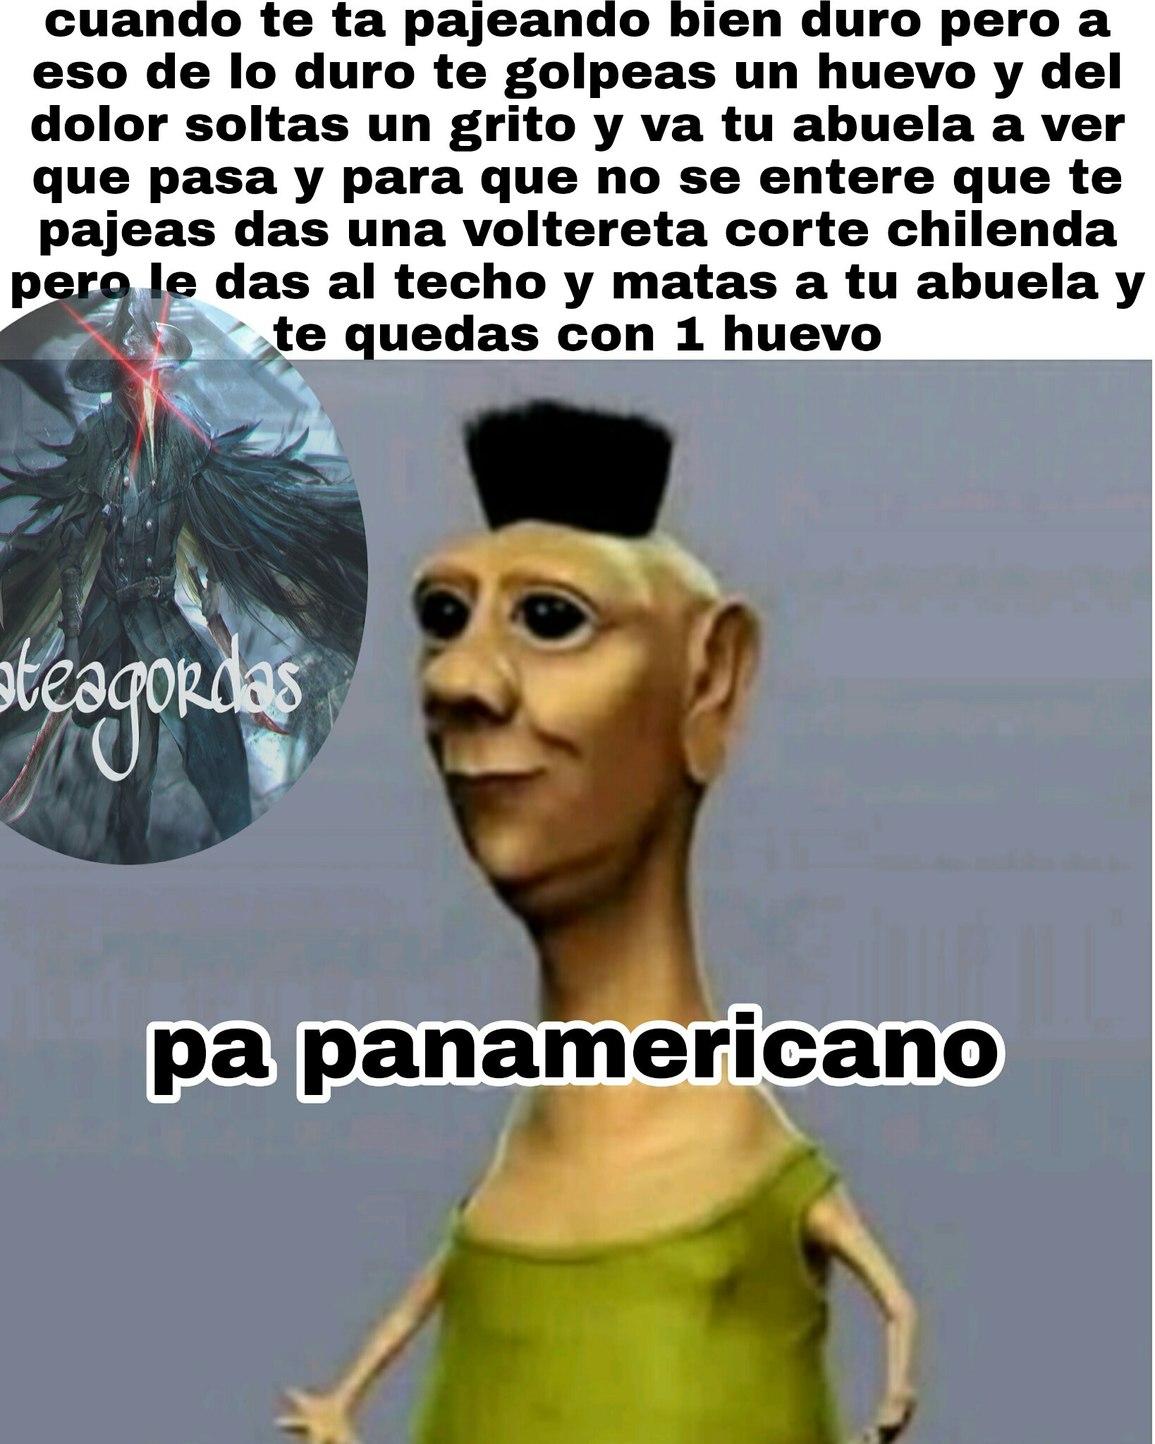 -20-10 0 - meme